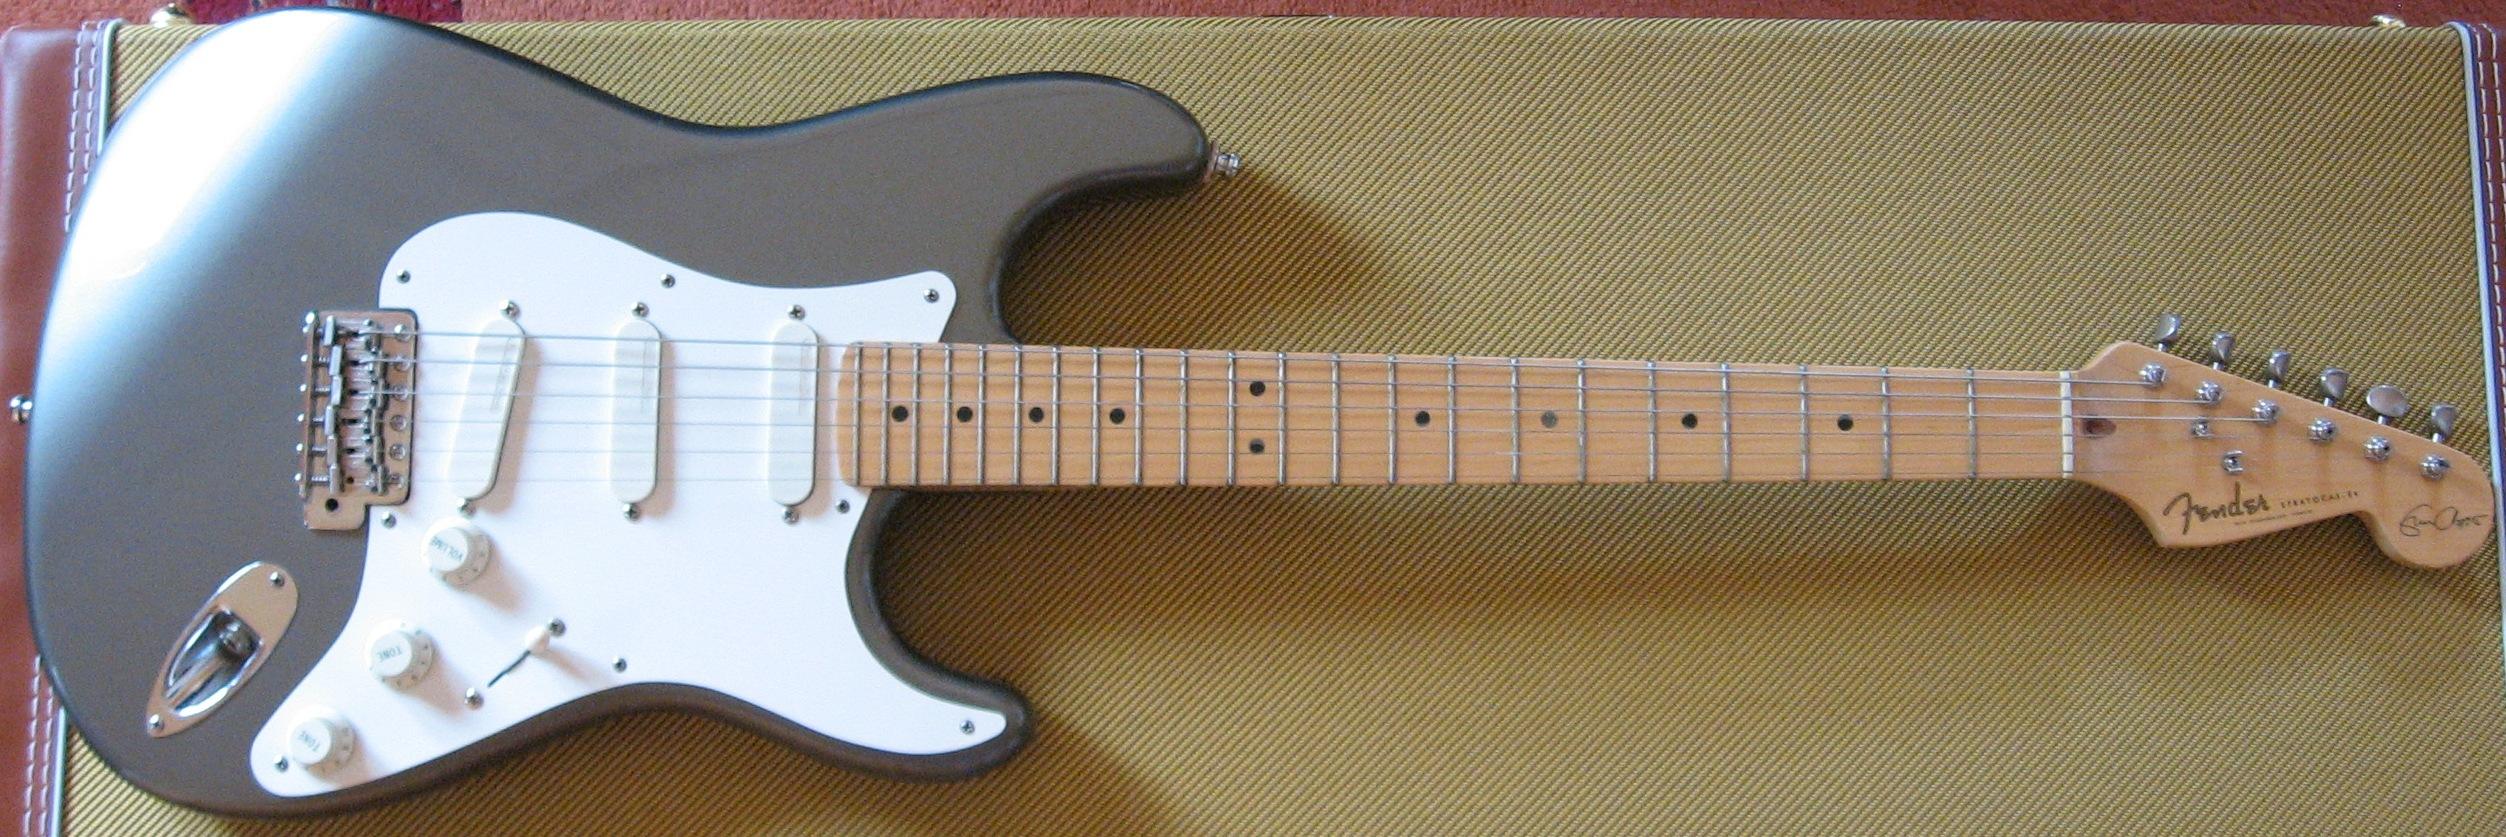 Fender Eric Clapton Stratocaster - Wikipedia